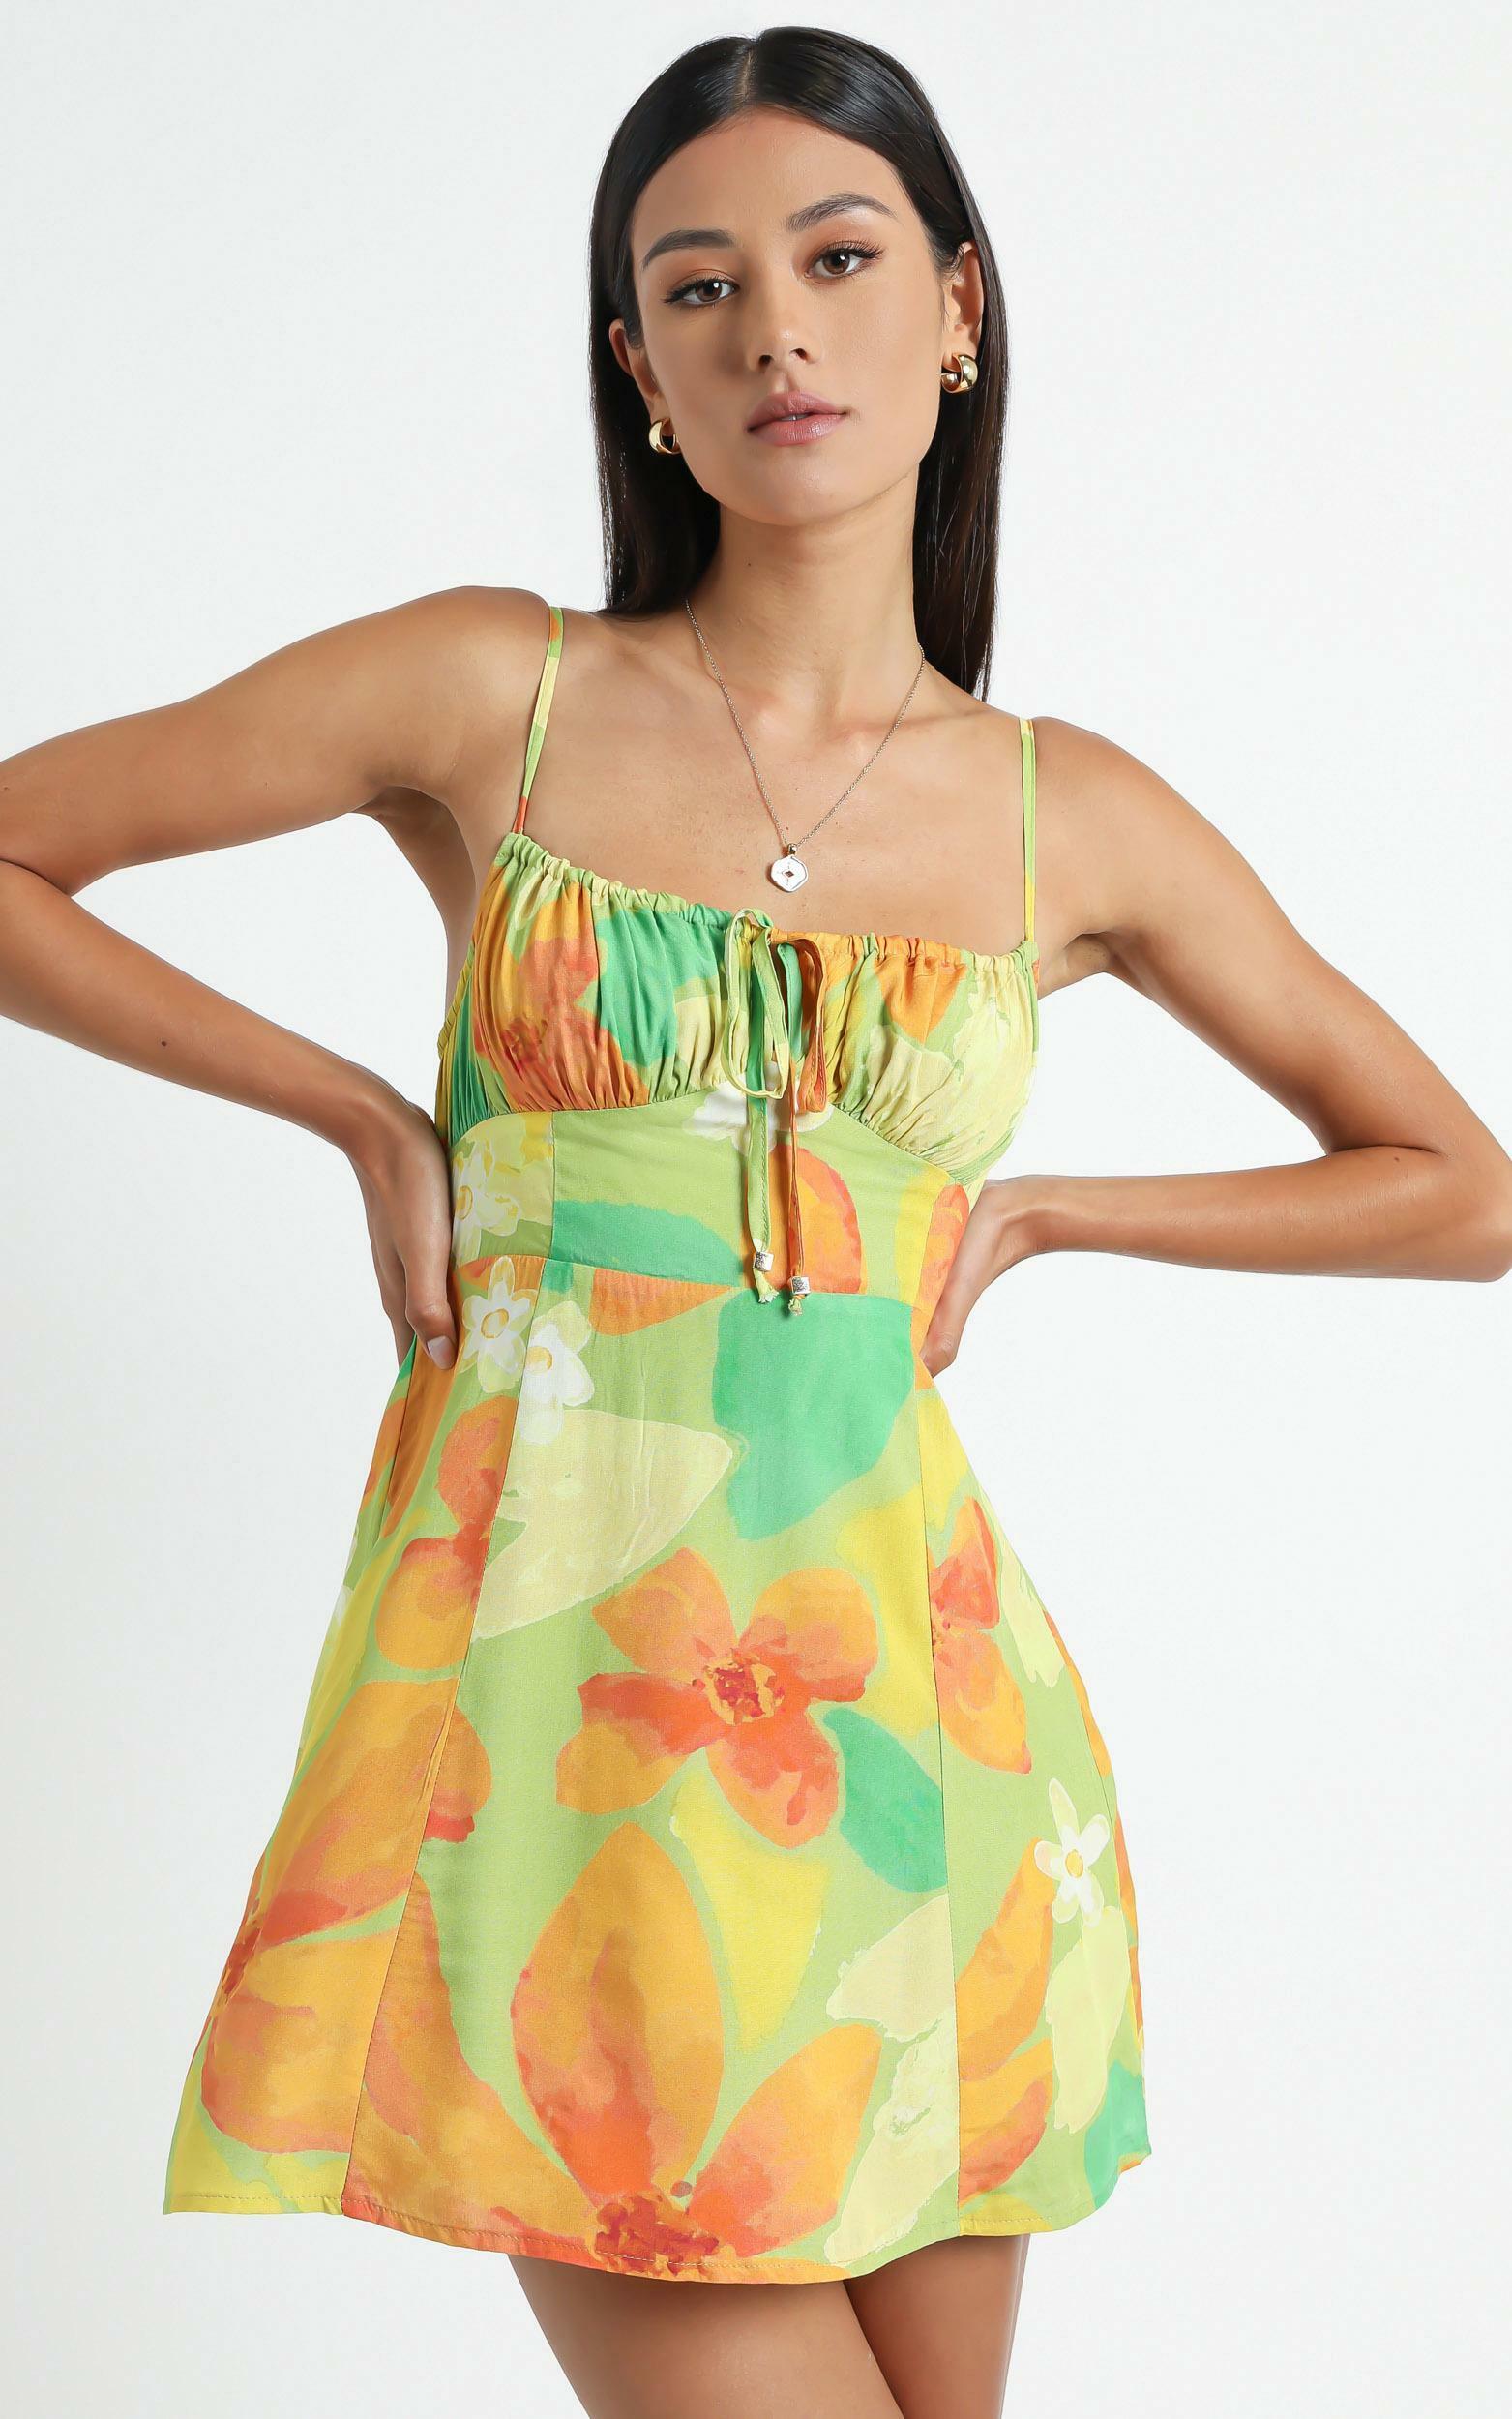 Barreta Dress in Tropical Floral - 6 (XS), MLT1, hi-res image number null